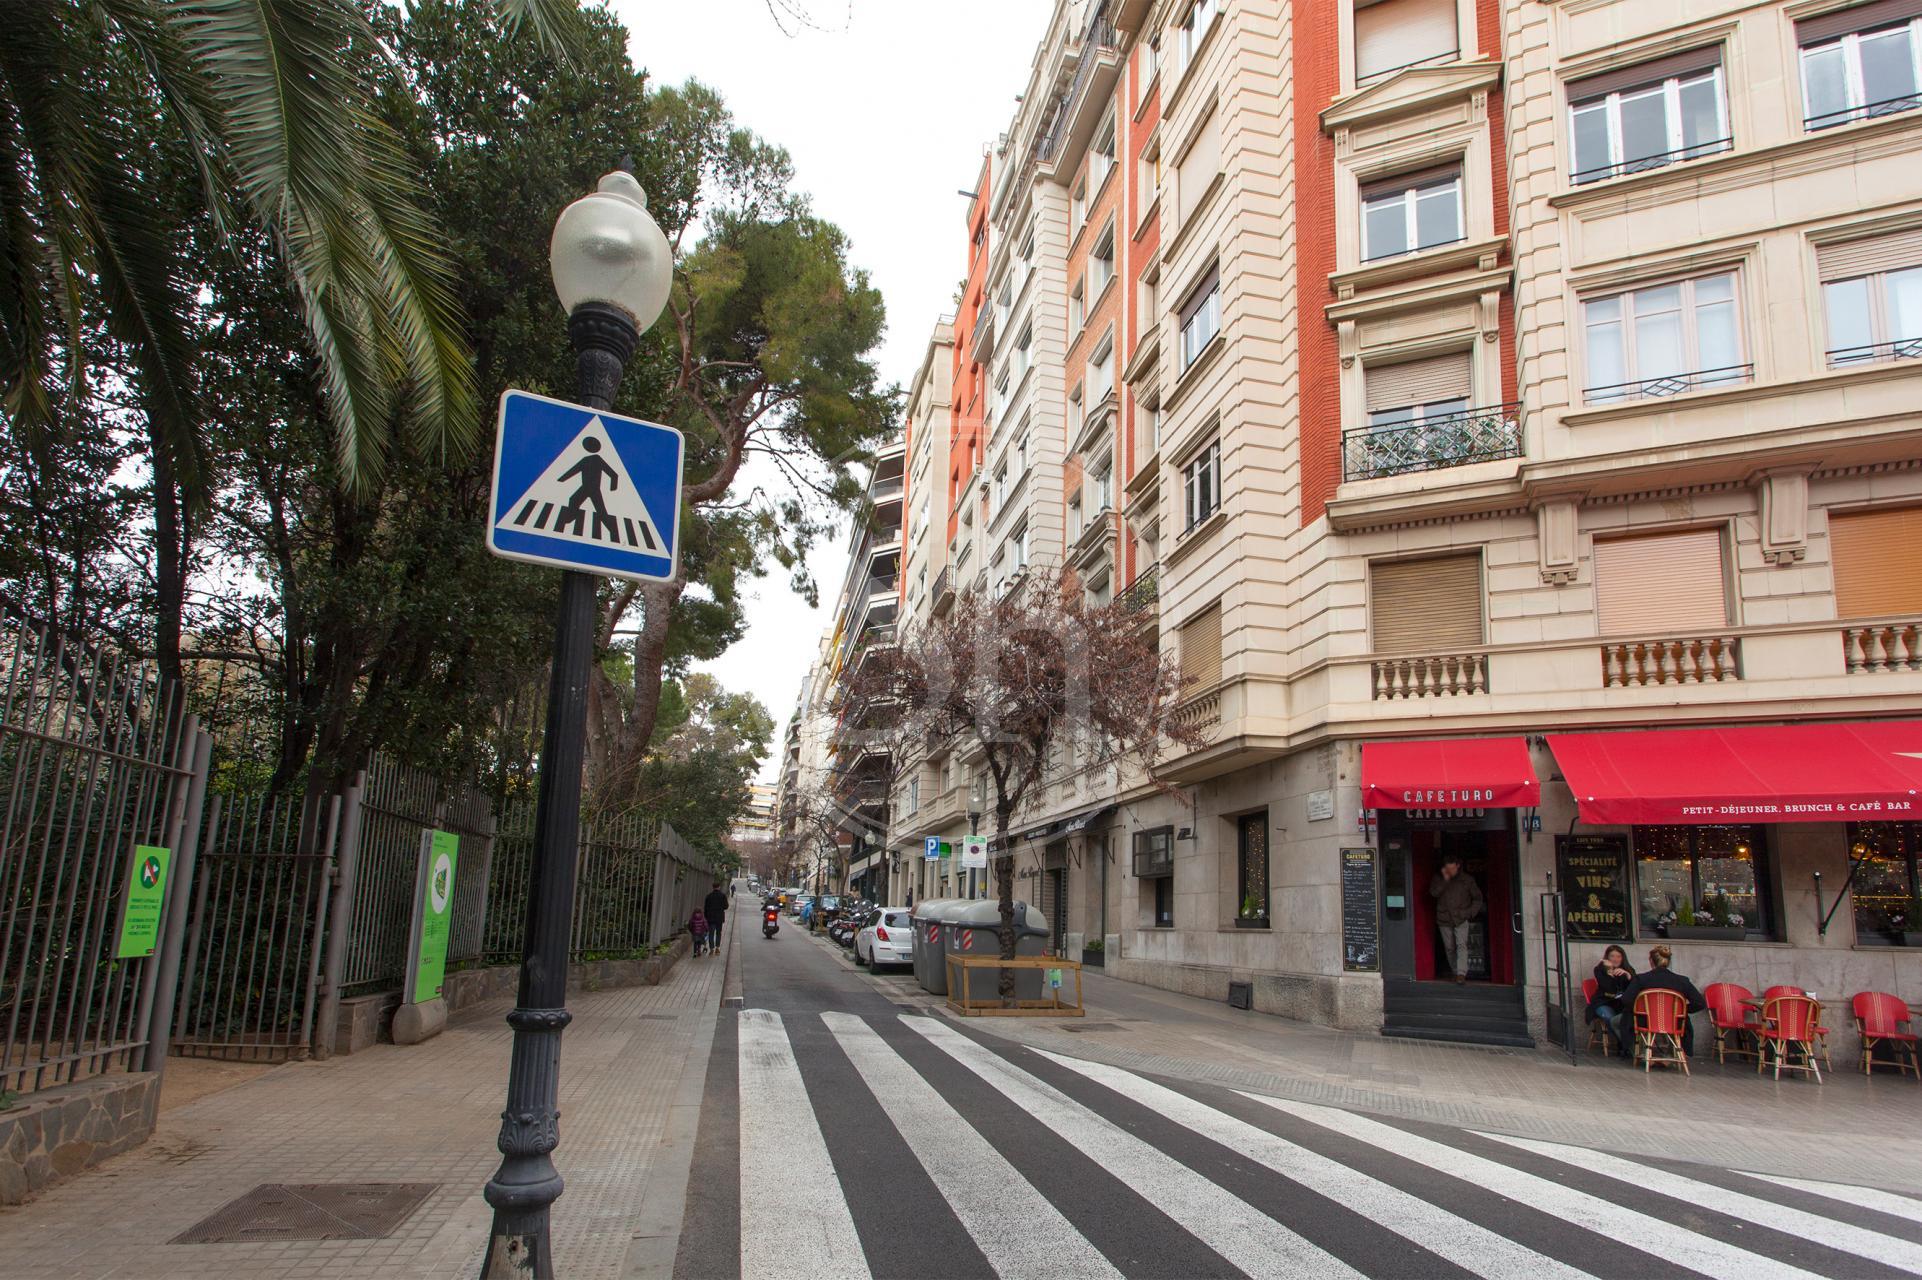 Pis en lloguer barcelona sarri sant gervasi ferran agull tur park - Lloguer pis barcelona particular ...